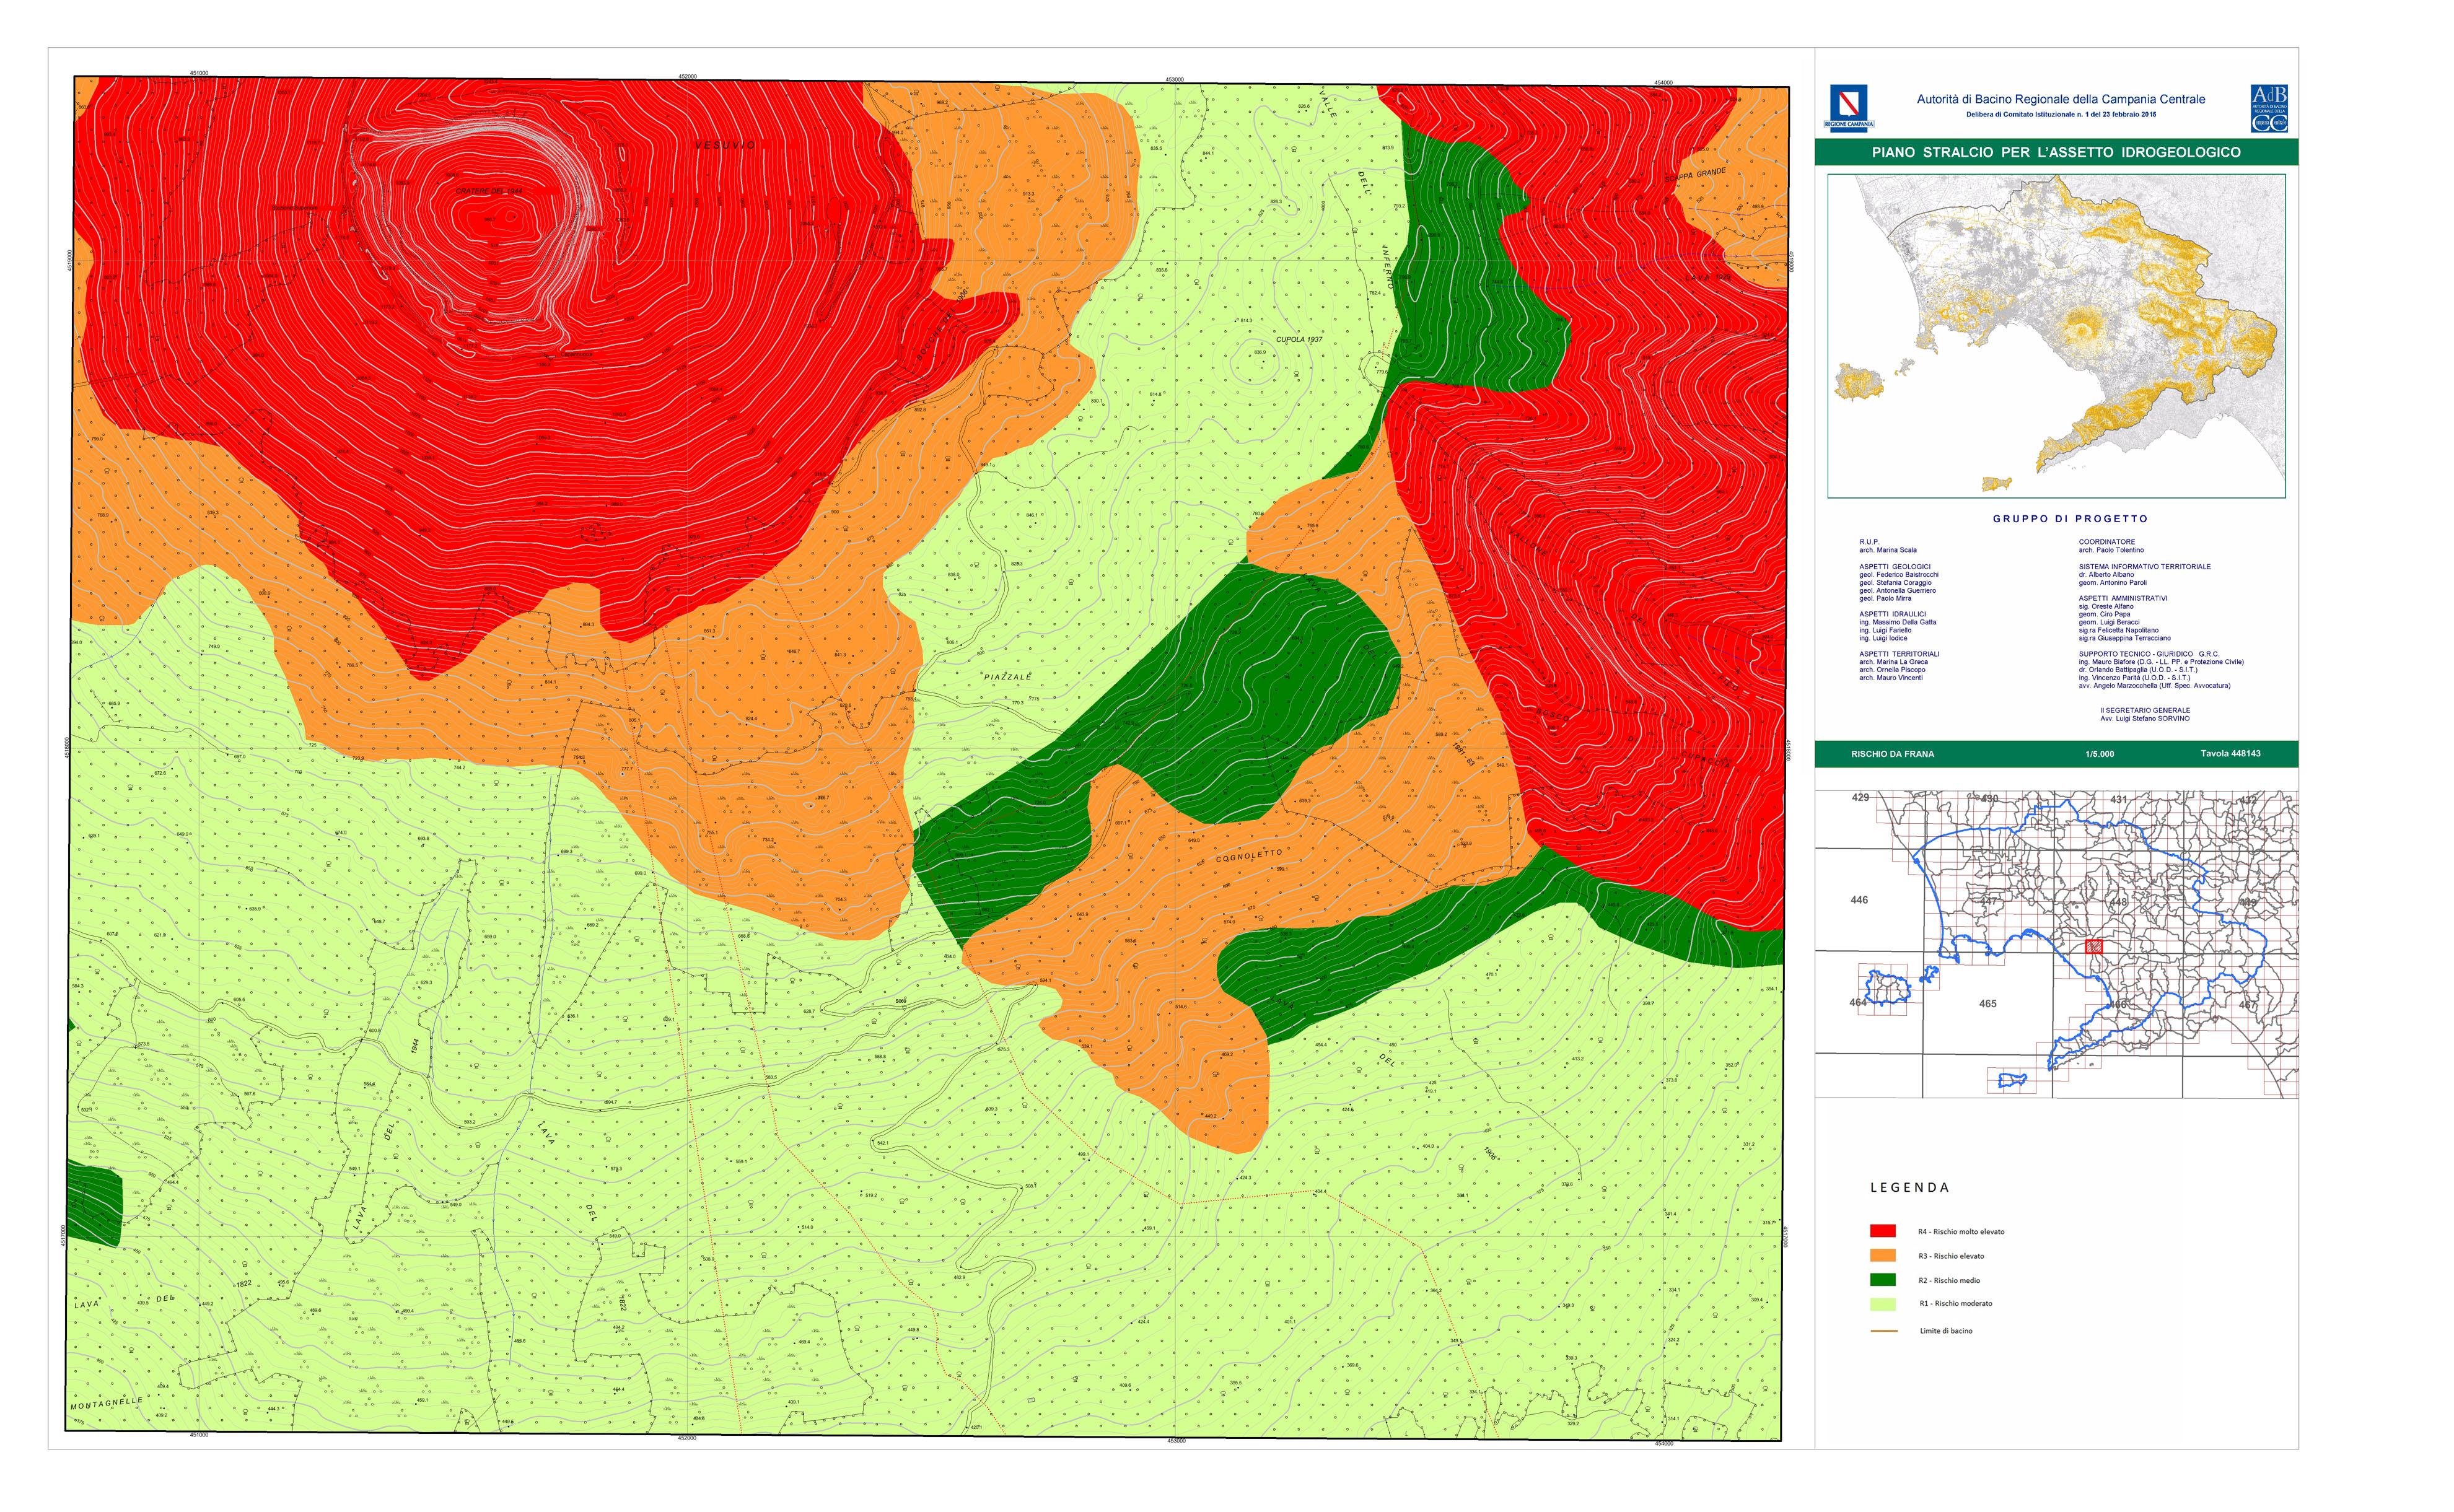 Figura 3 - Mappa rischio frana Tavola 448143